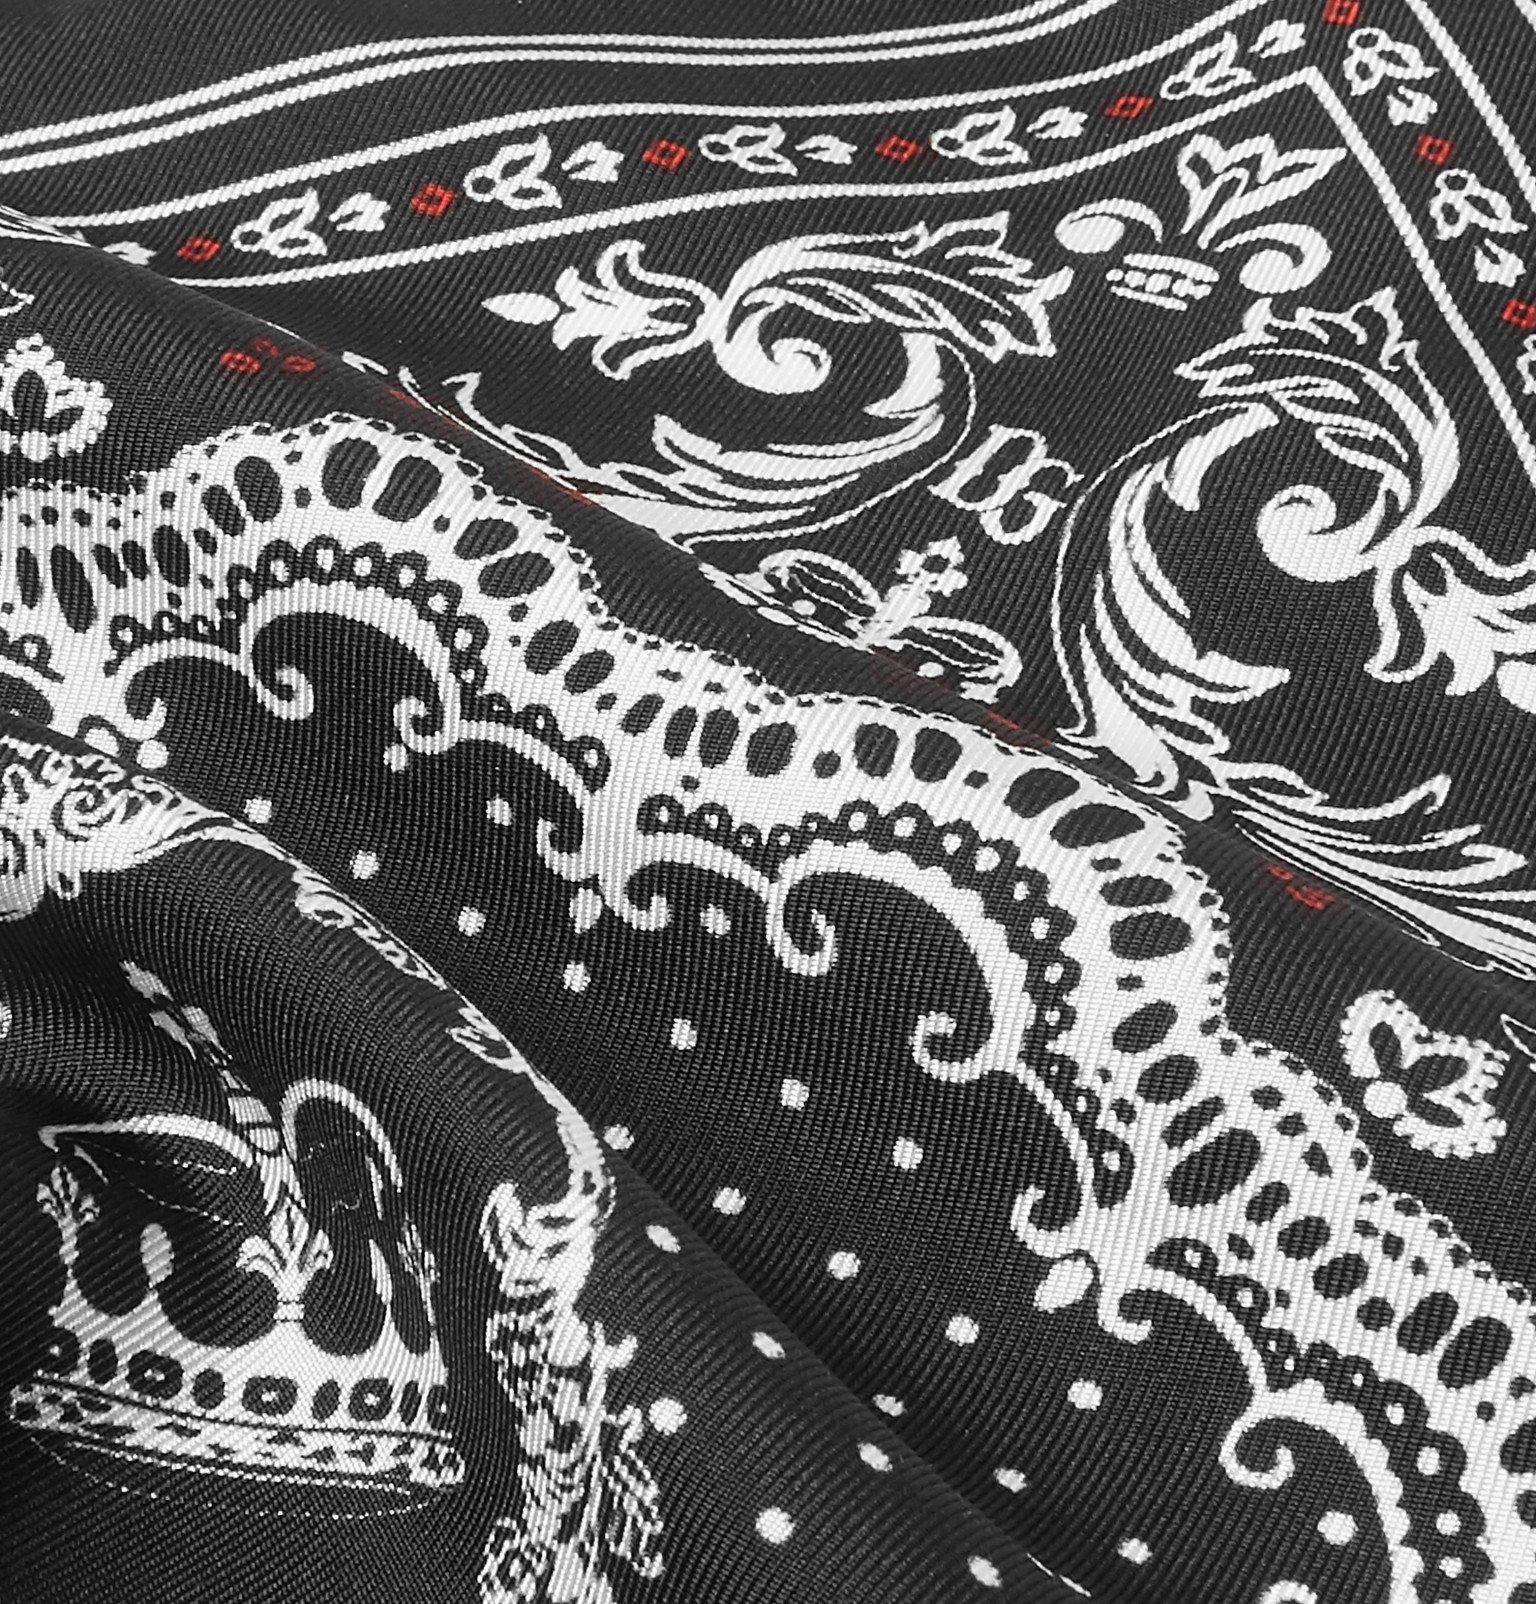 Dolce & Gabbana - Printed Silk-Twill Pocket Square - Black